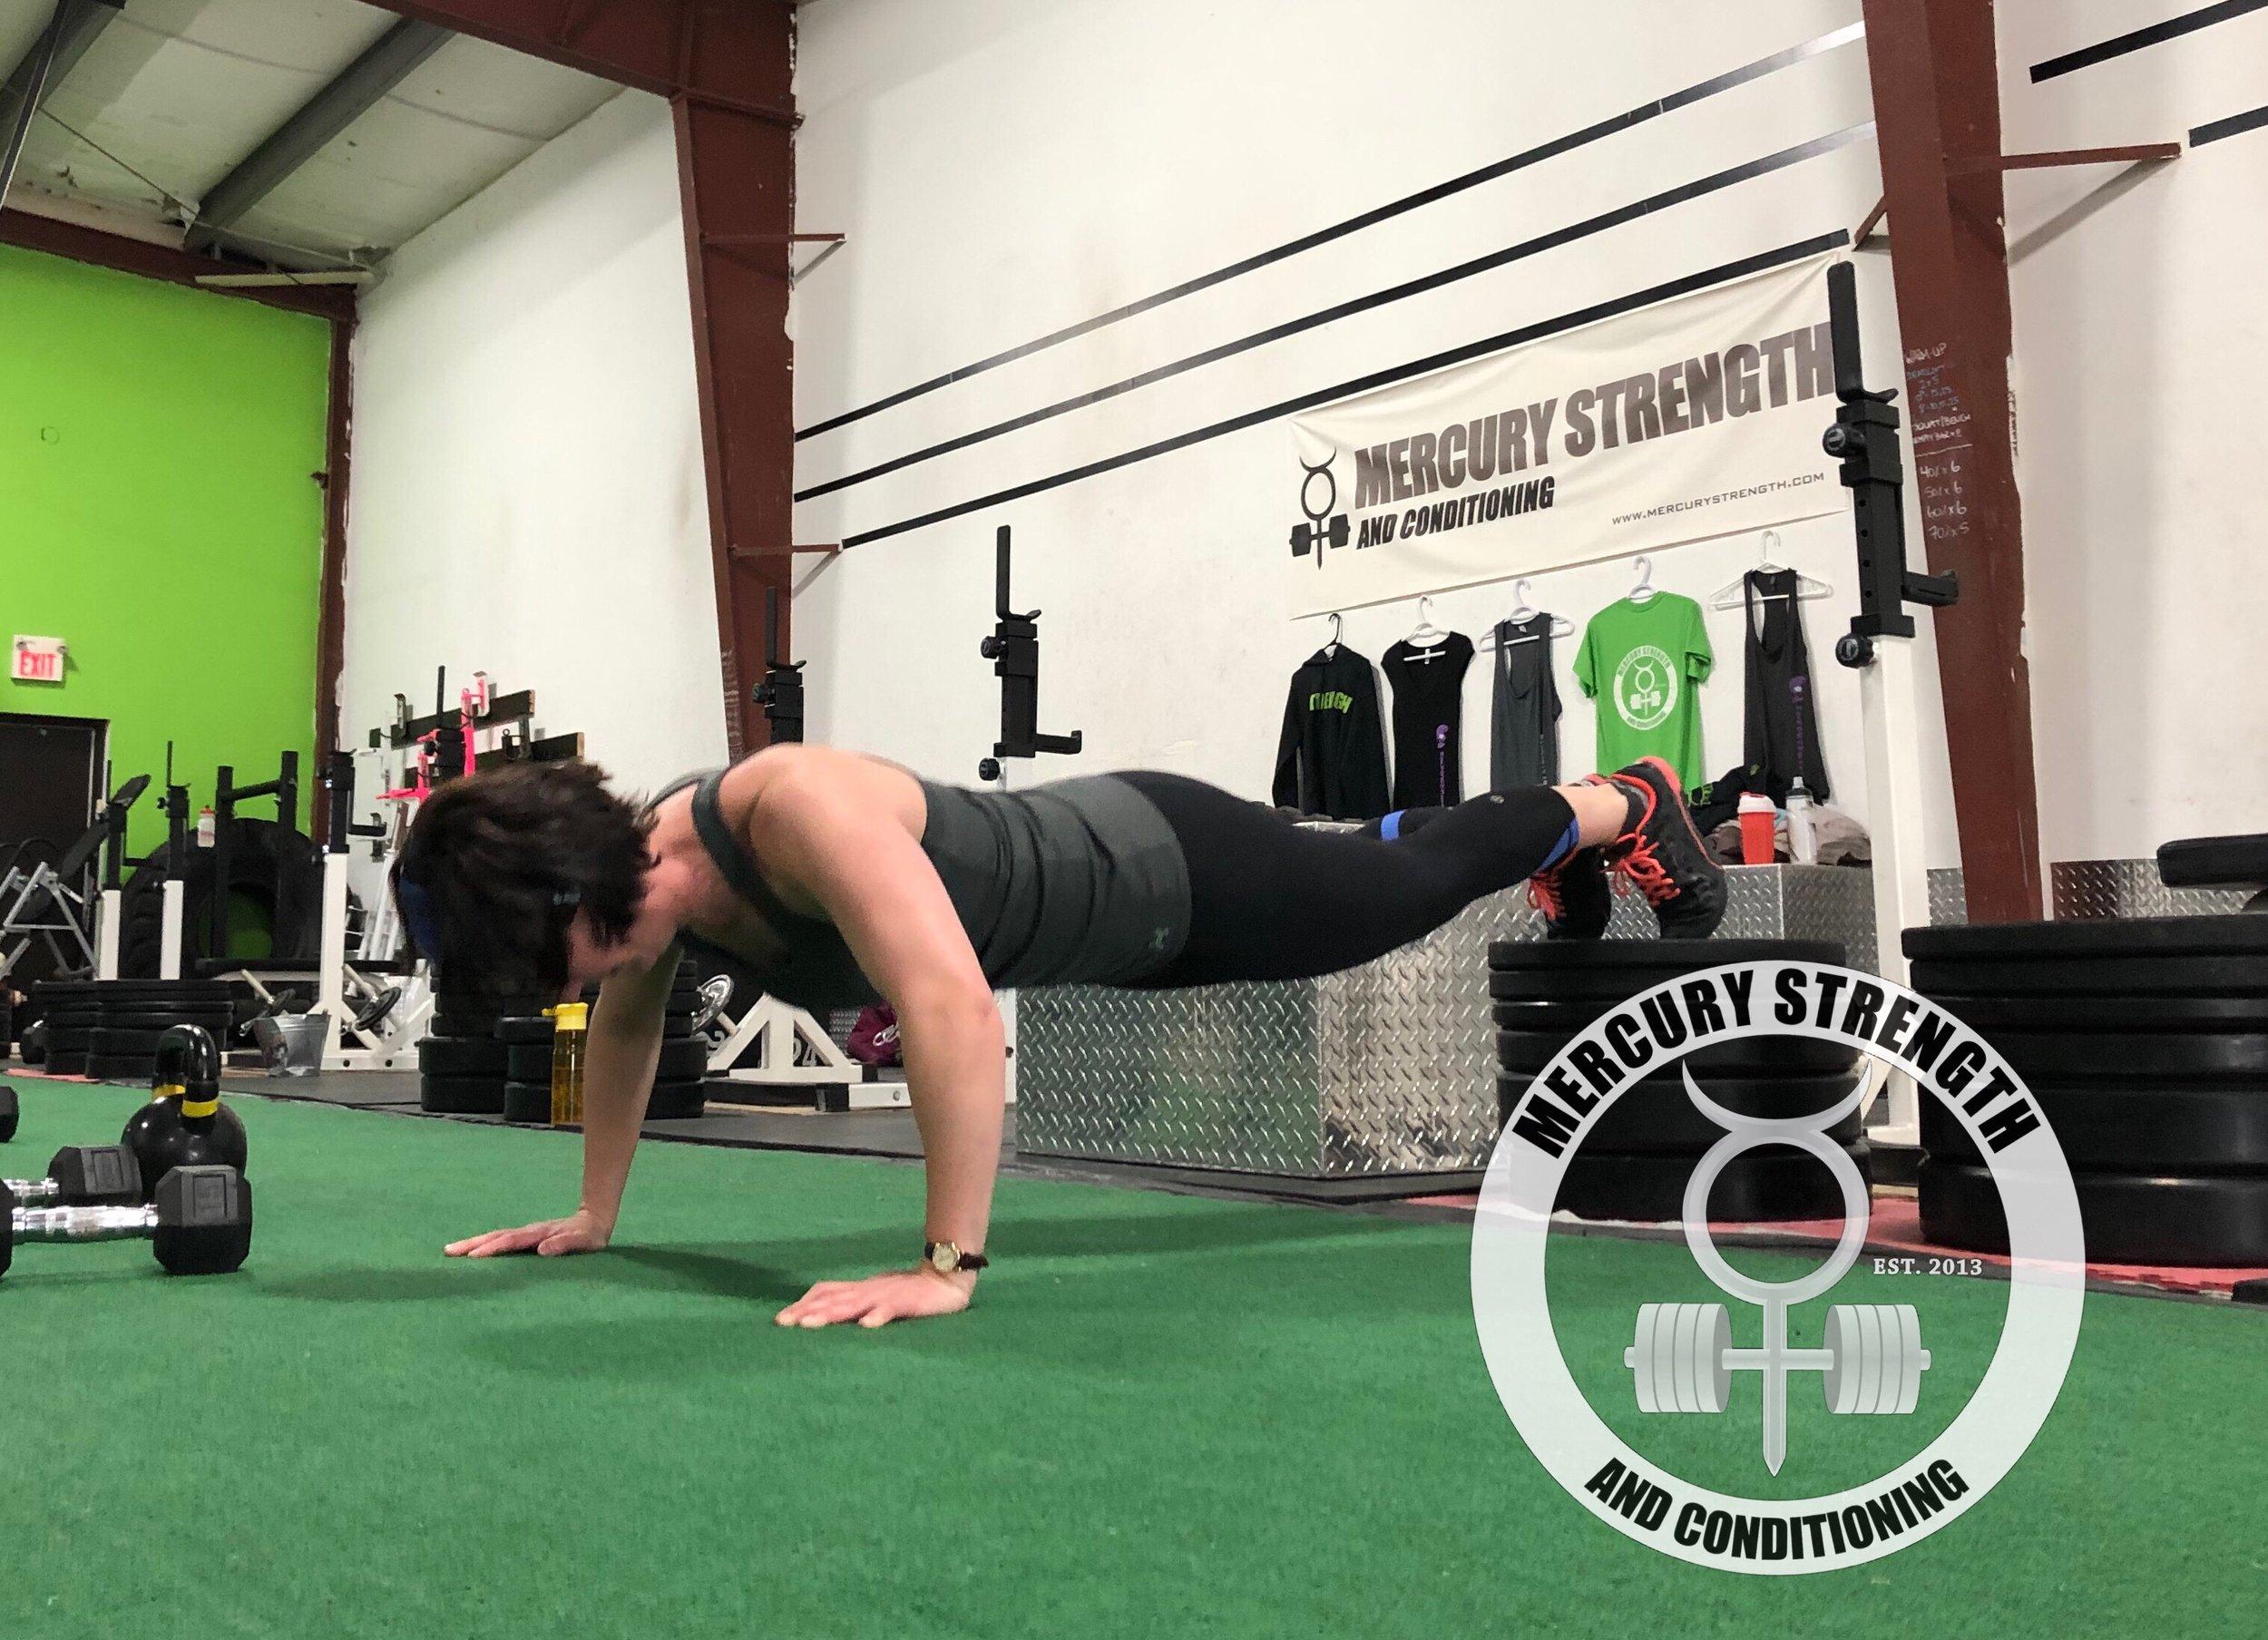 Gym-powerlifting-fitness-personal training-training-bootcamp-crossfit-kingston-kingston gym-kids-mercury-strength-conditioning-athlete-push up